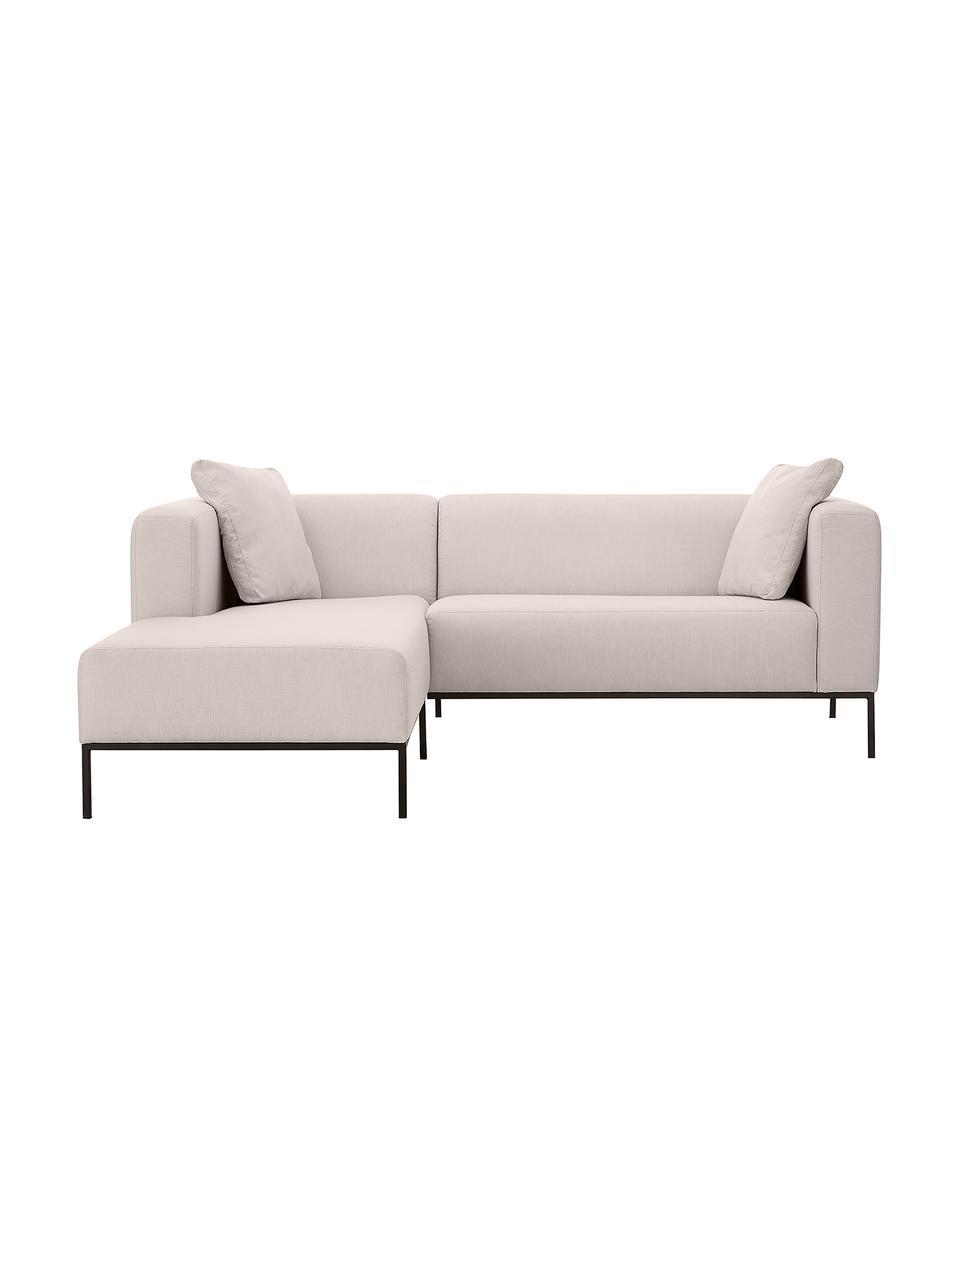 Canapé d'angle gris clair Carrie, Tissu gris clair